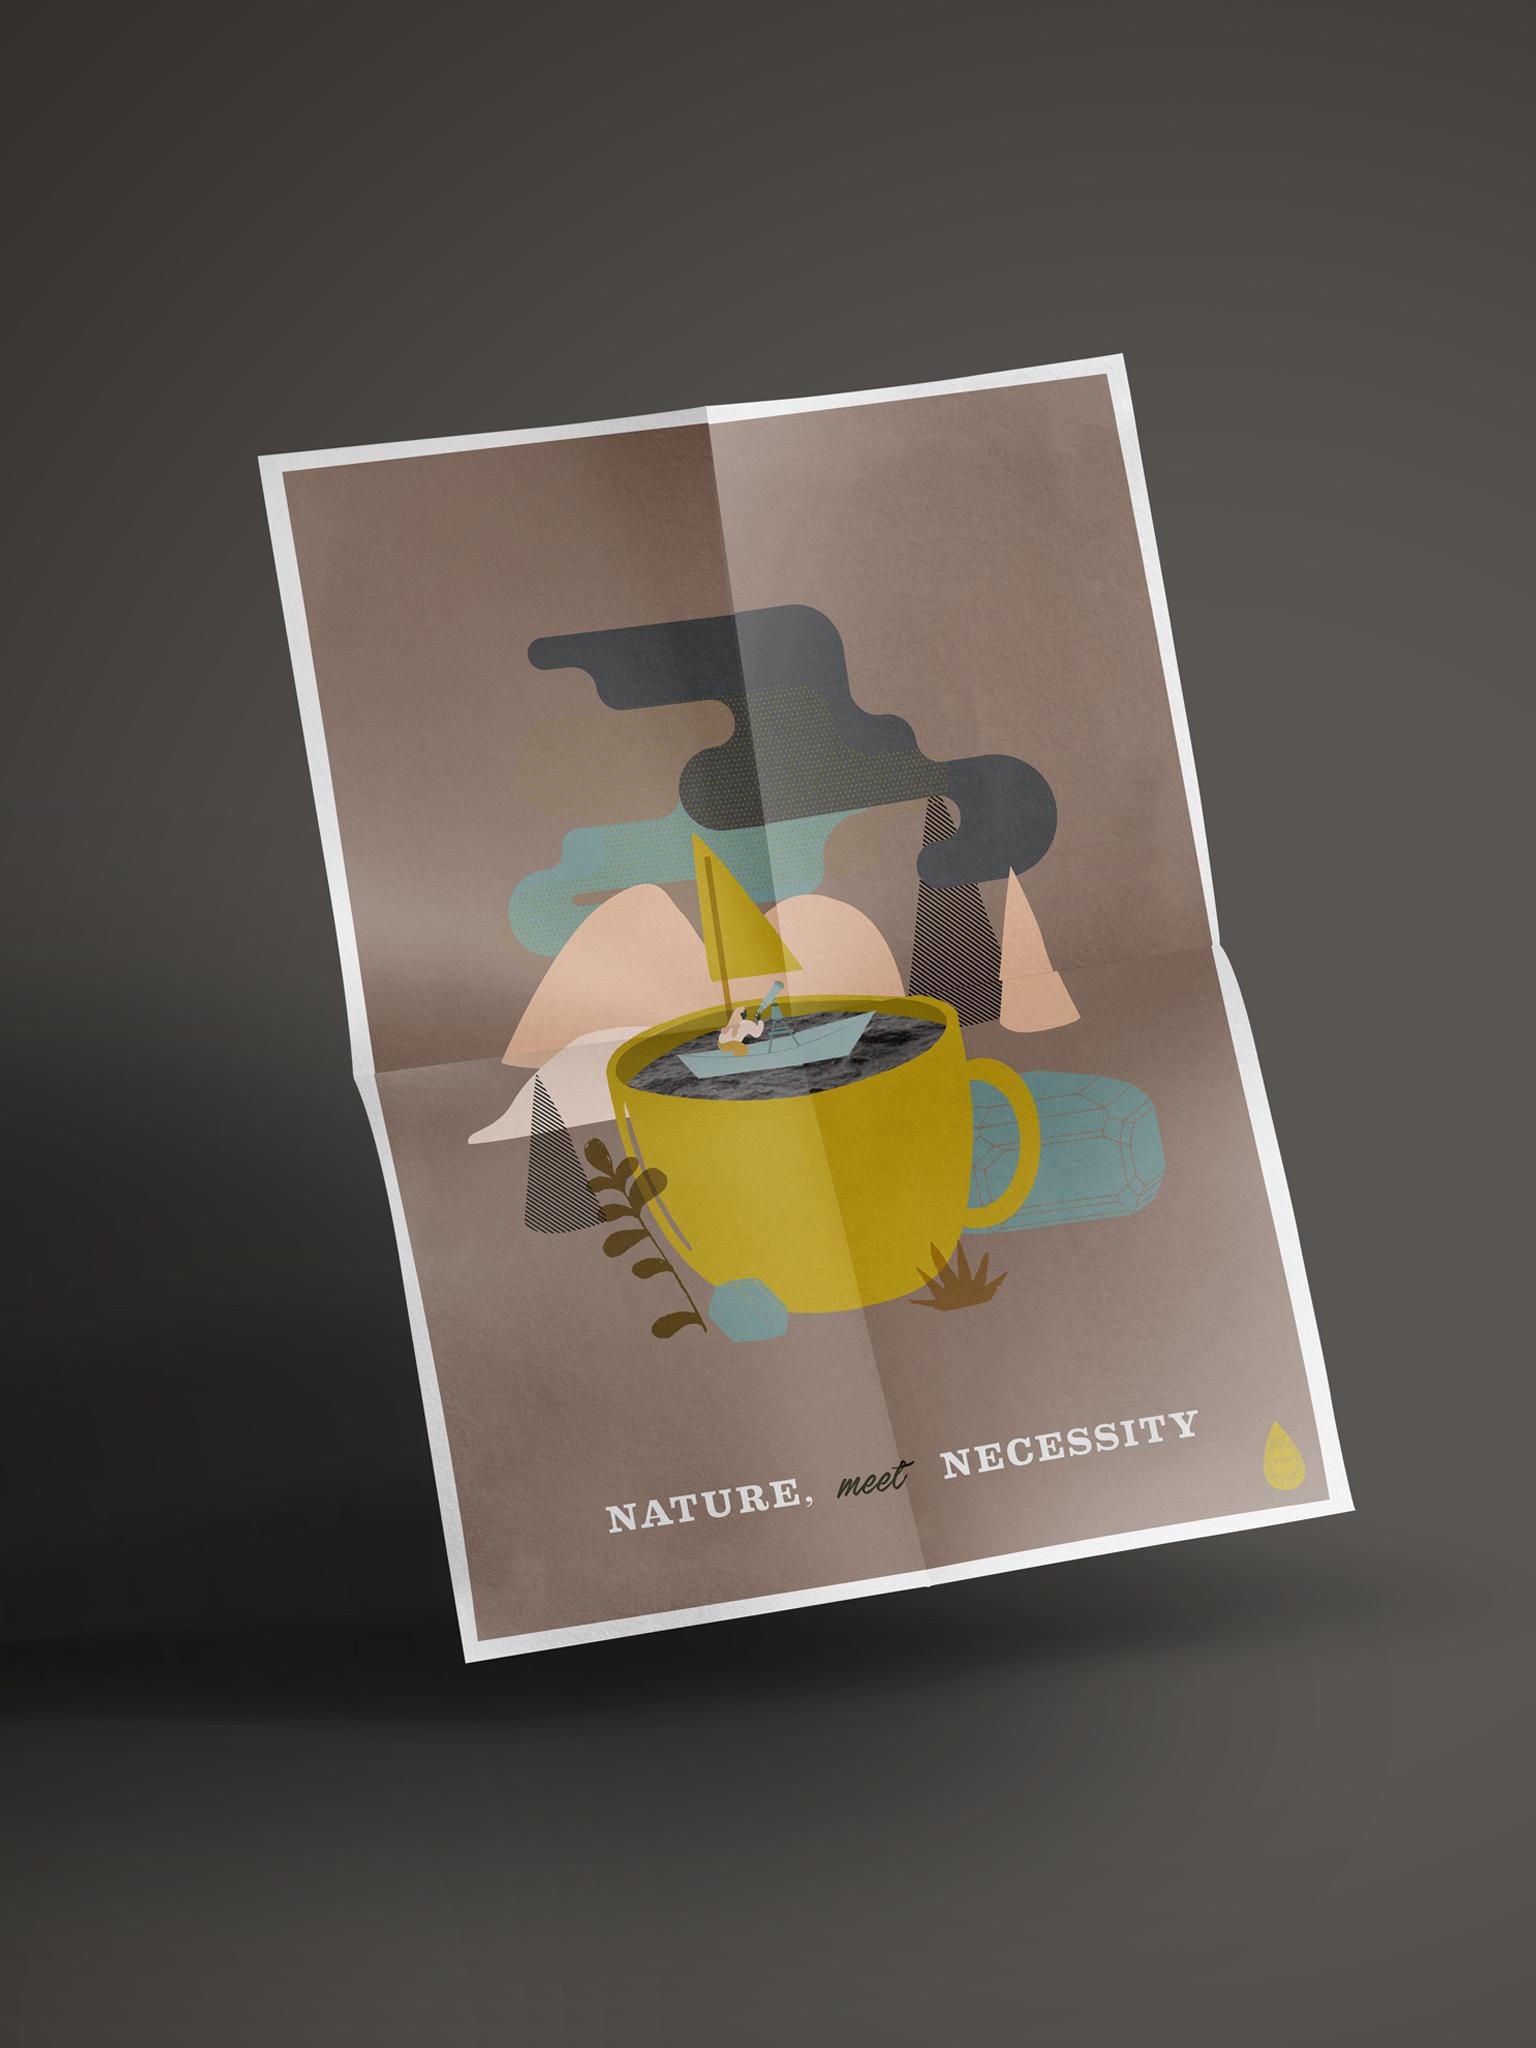 posterfront_03.jpg